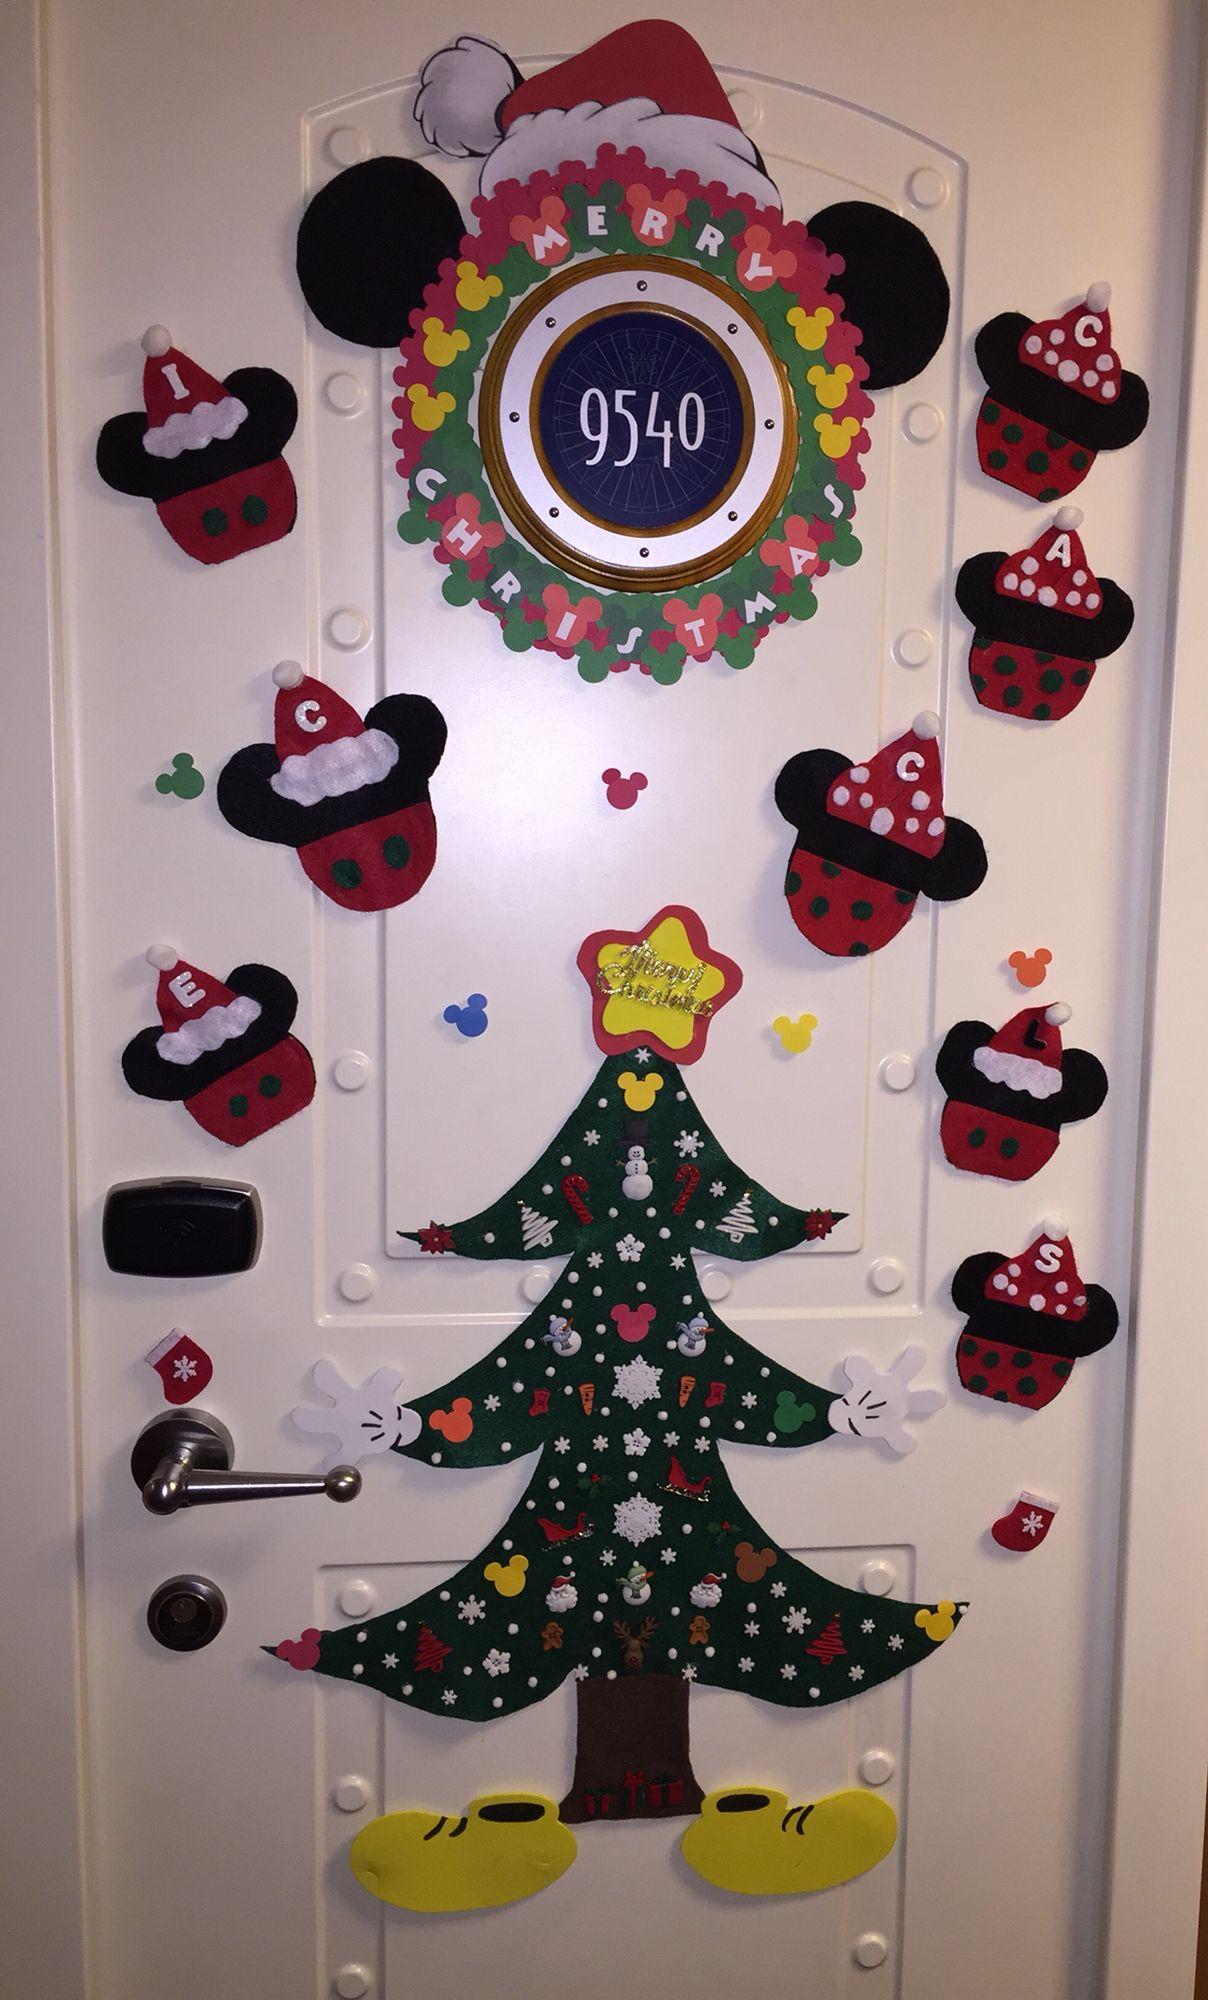 Disney Cruise Christmas decorated cabin door.